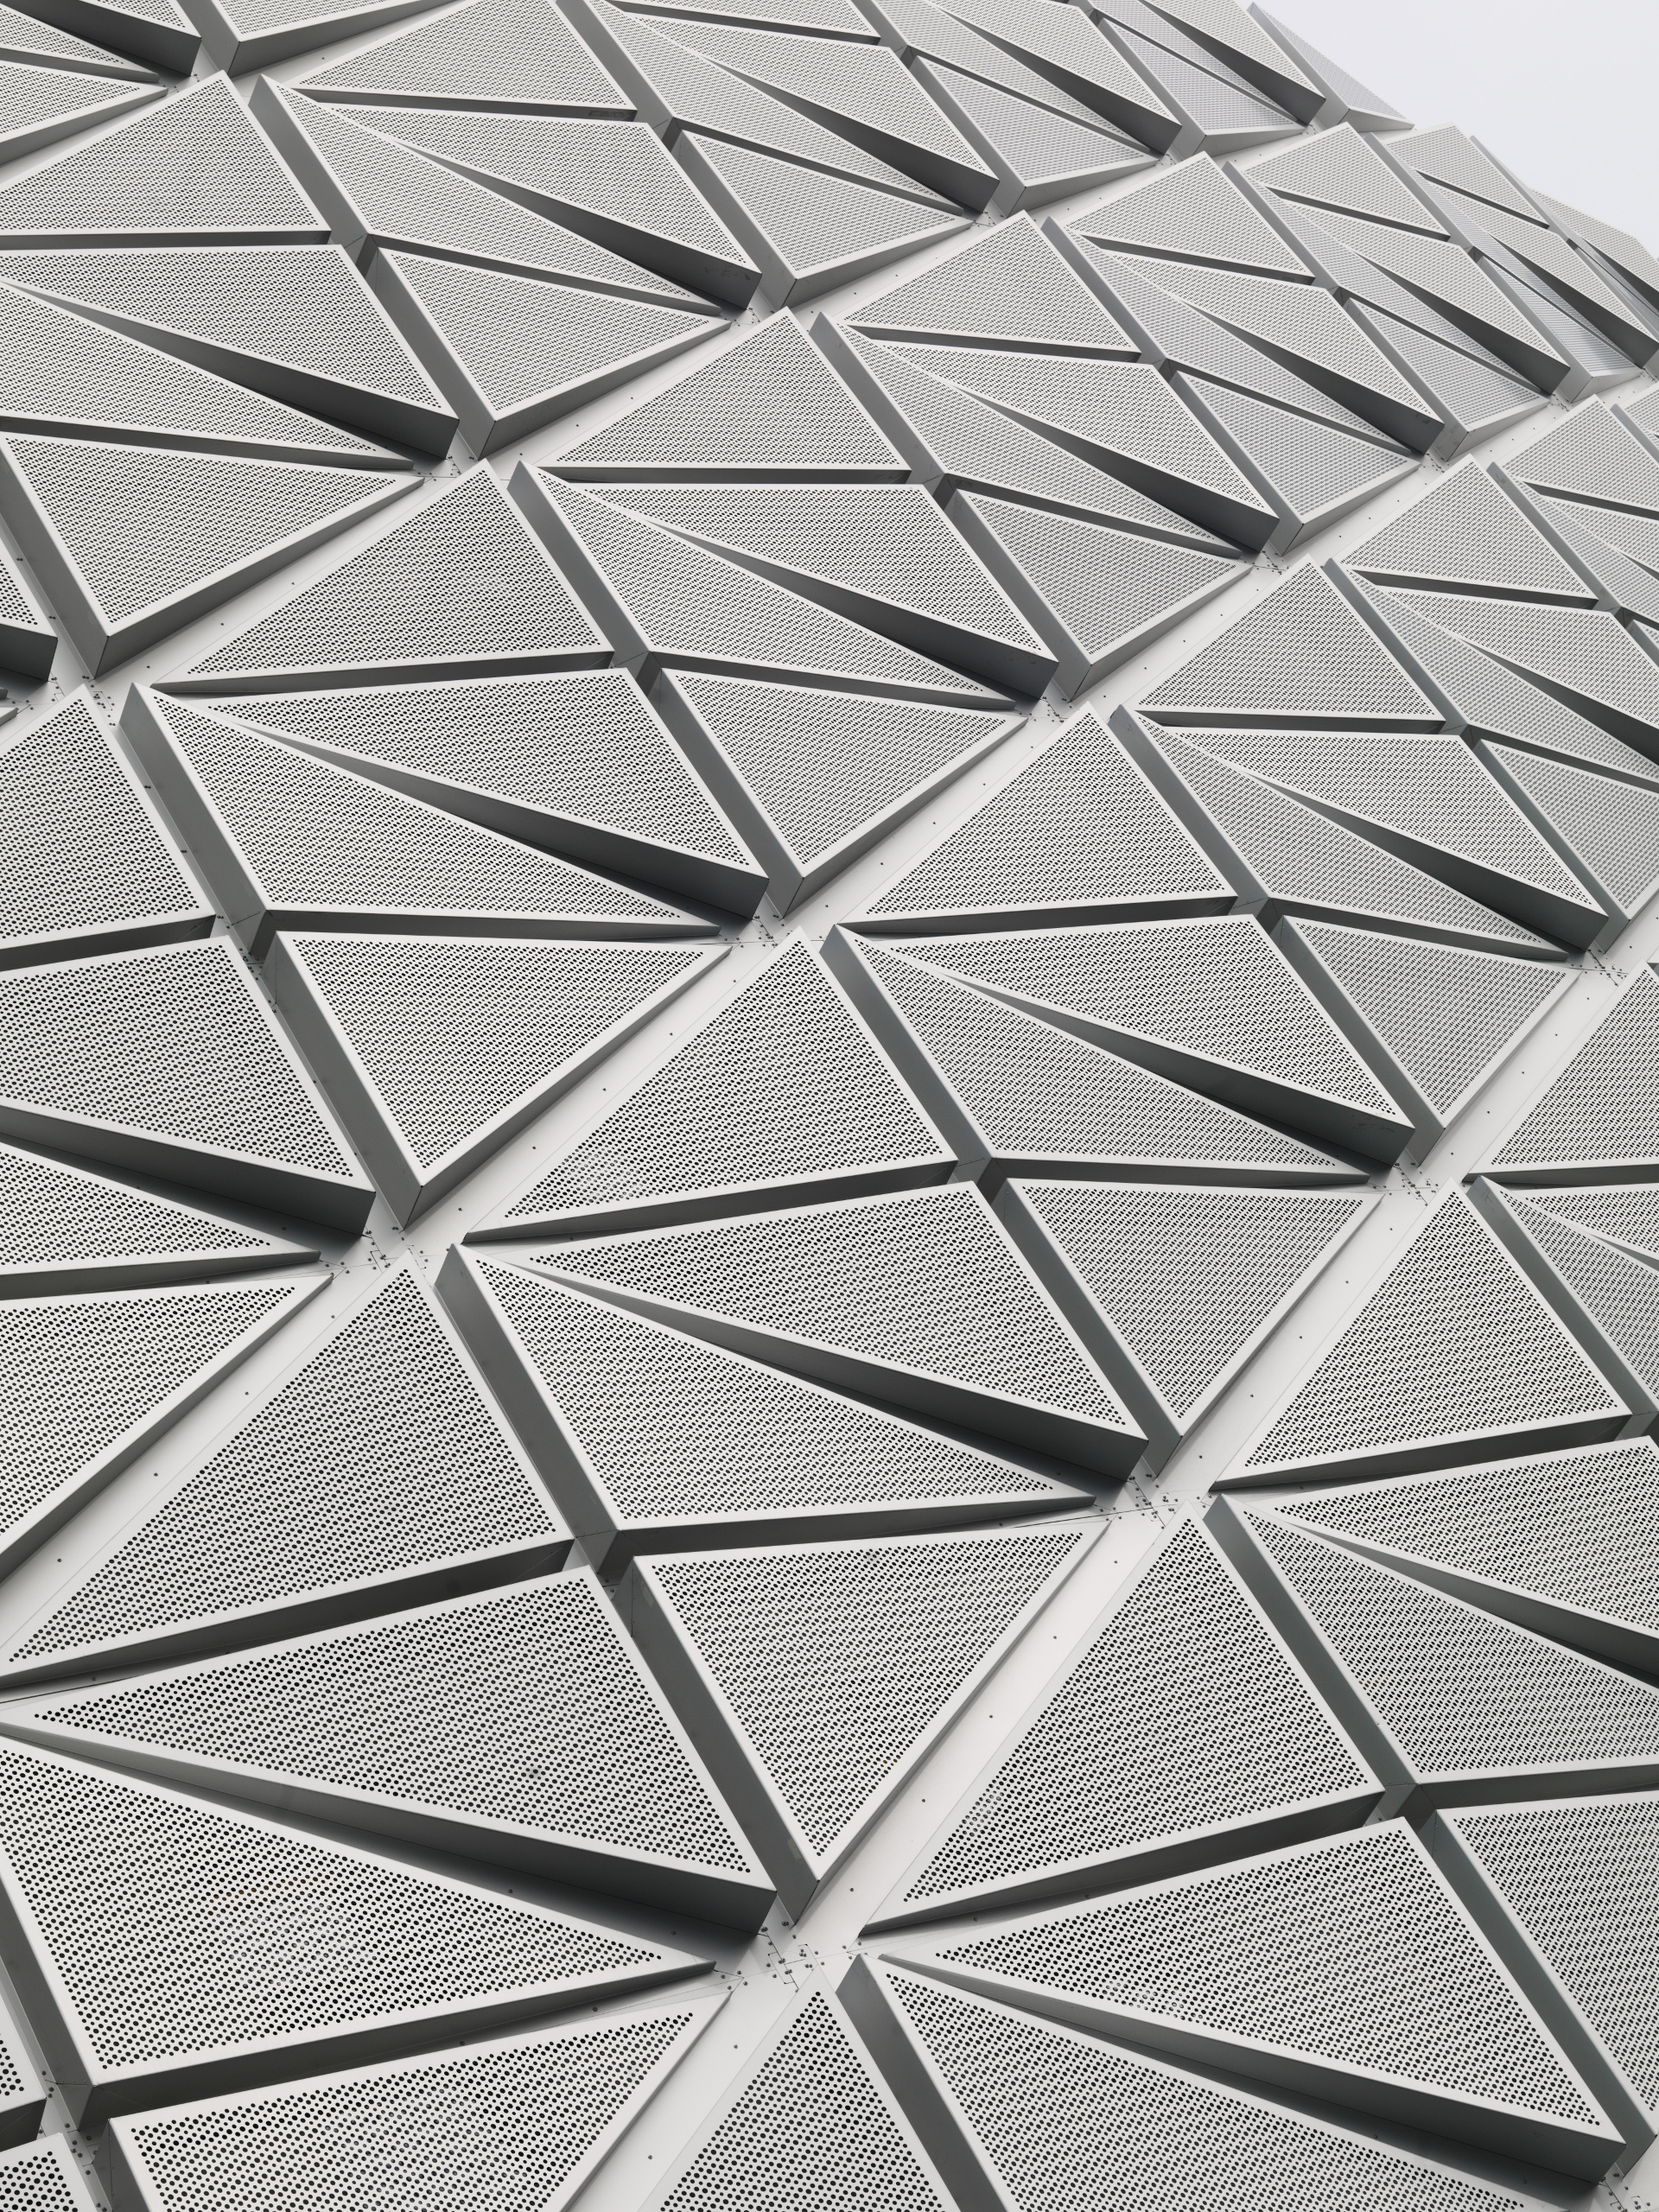 Facciata microforata per la tecnologica Friends Arena di Berg, C. F. Møller e Krook & Tjade